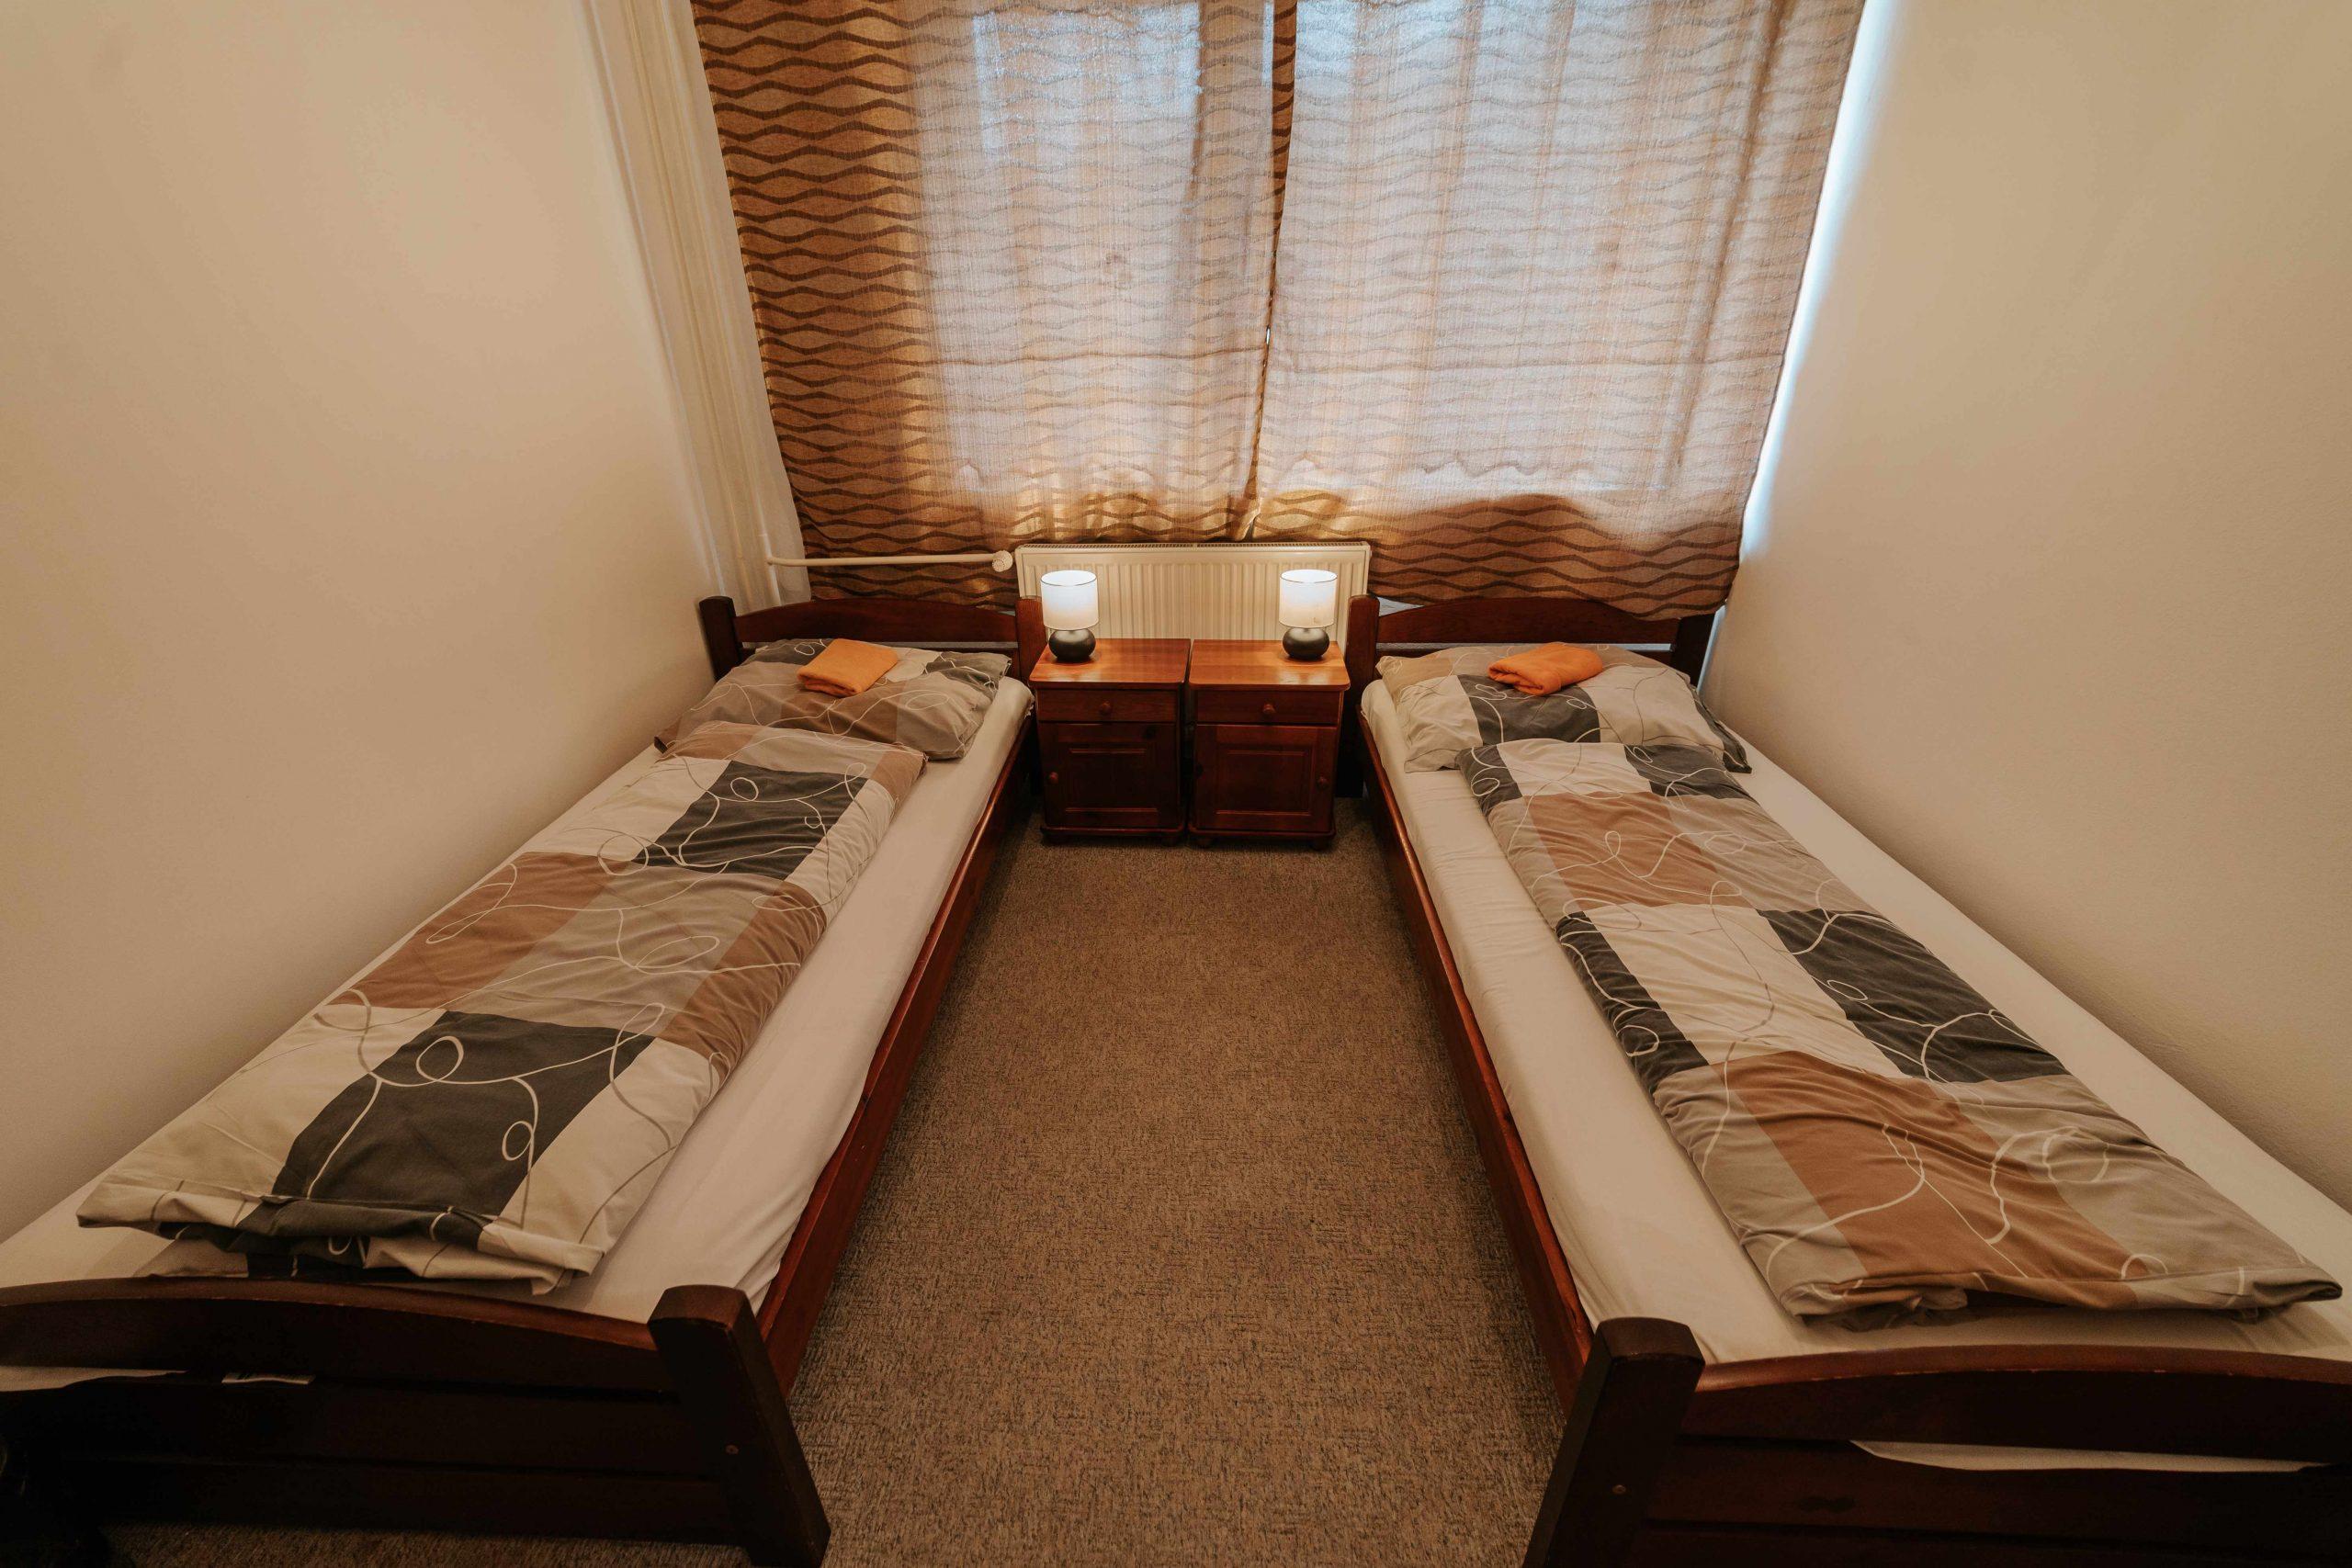 Dvôjlôžková izba